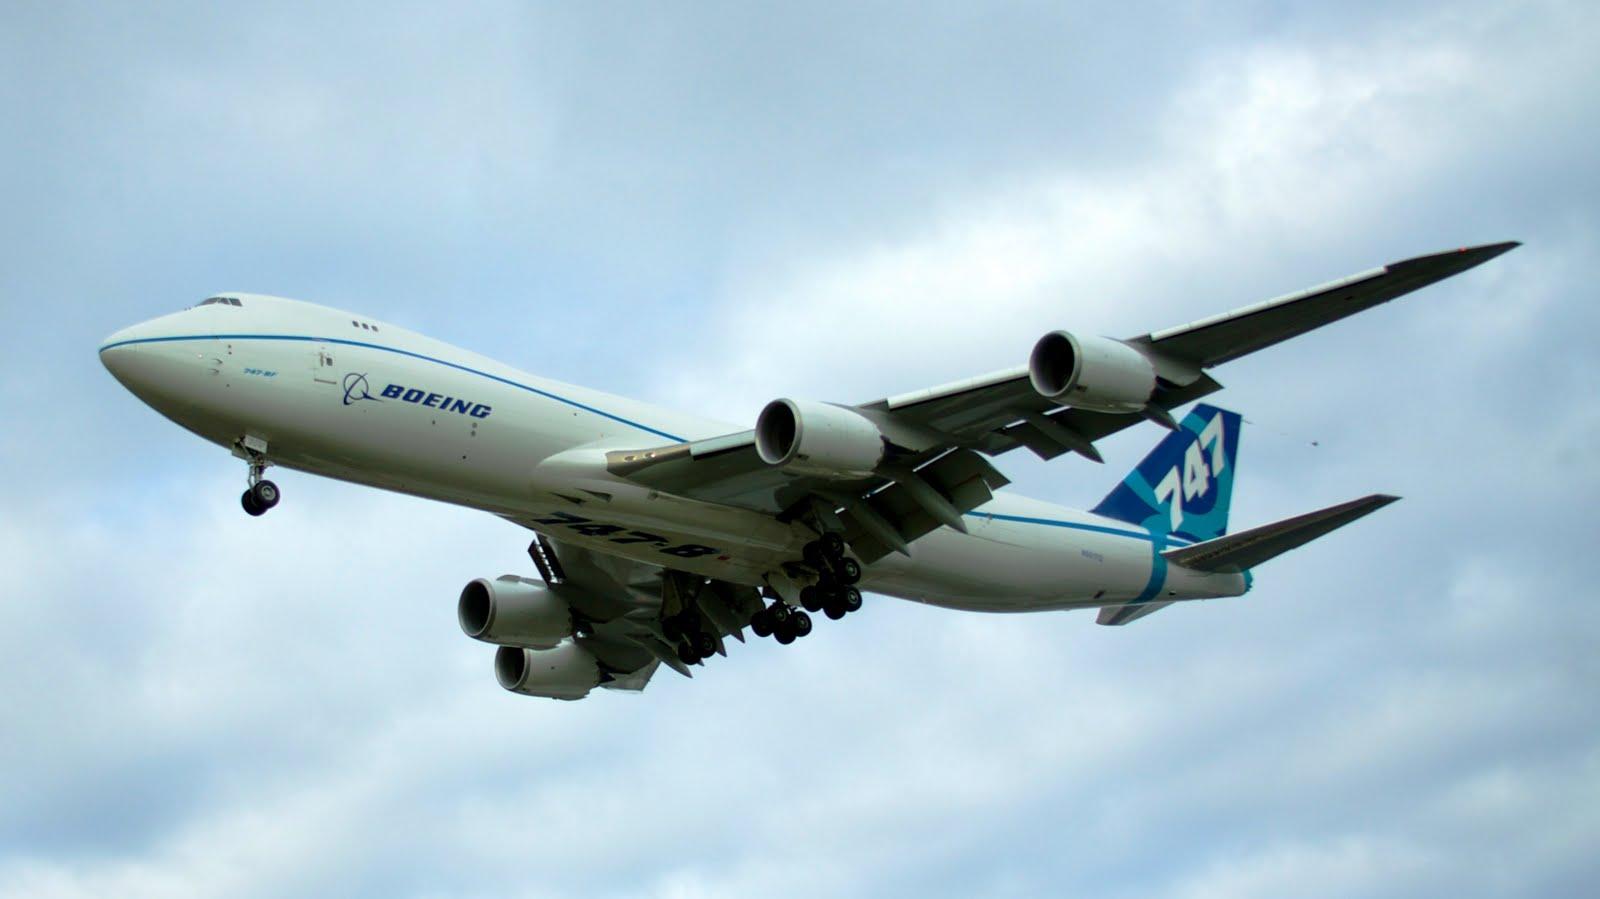 http://3.bp.blogspot.com/-Y7poxShmkI8/TjbfiRMM_SI/AAAAAAAAGI0/jOHwjlV4HVY/s1600/Boeing_747-8F_inflight_817521_aircraft-wallpaper.jpg